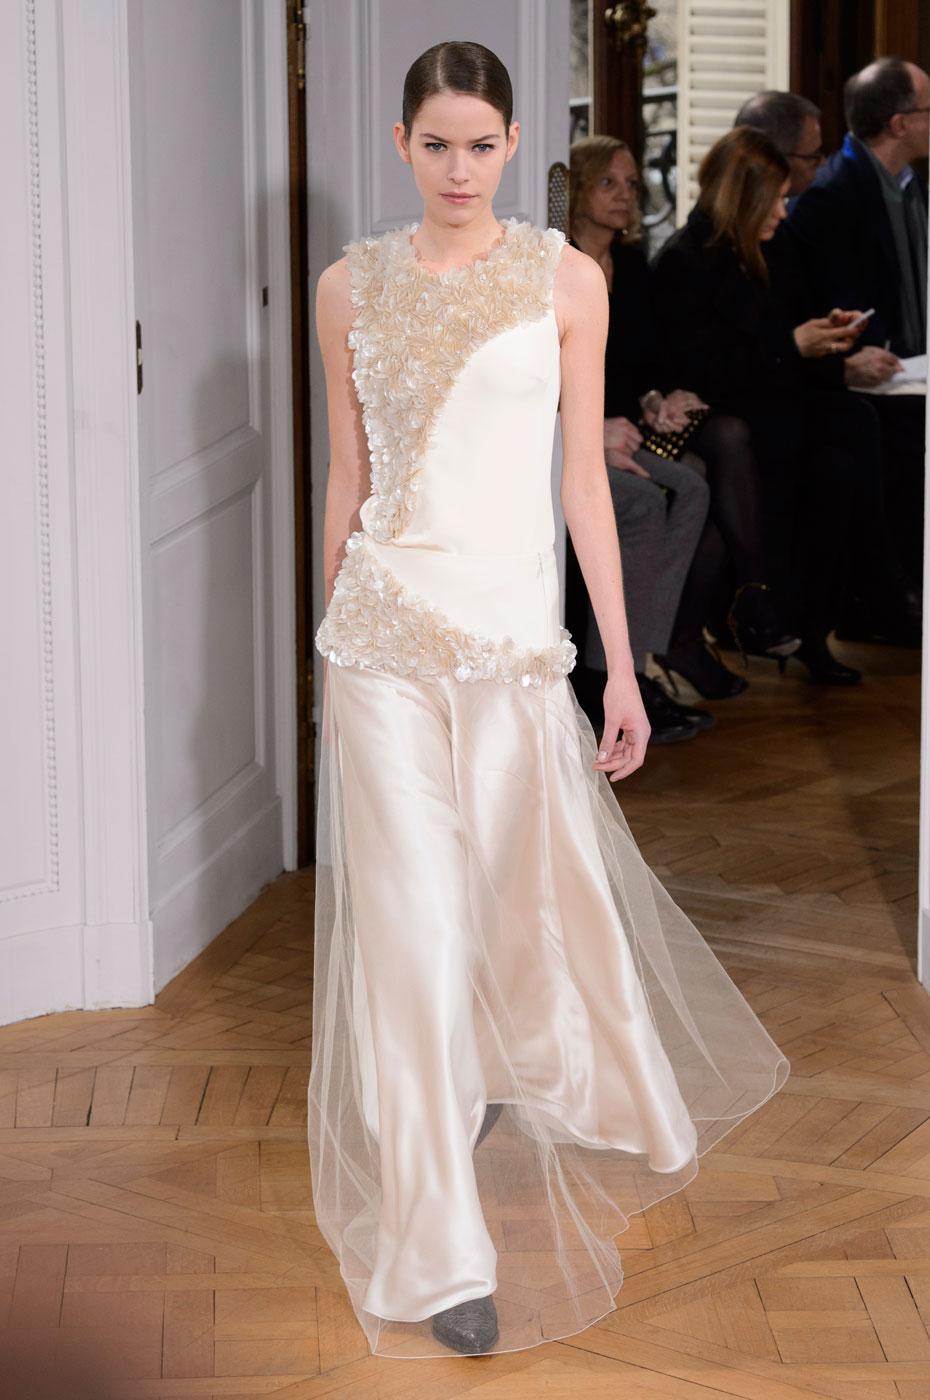 Bouchra-Jarrar-fashion-runway-show-haute-couture-paris-spring-summer-2015-the-impression-43